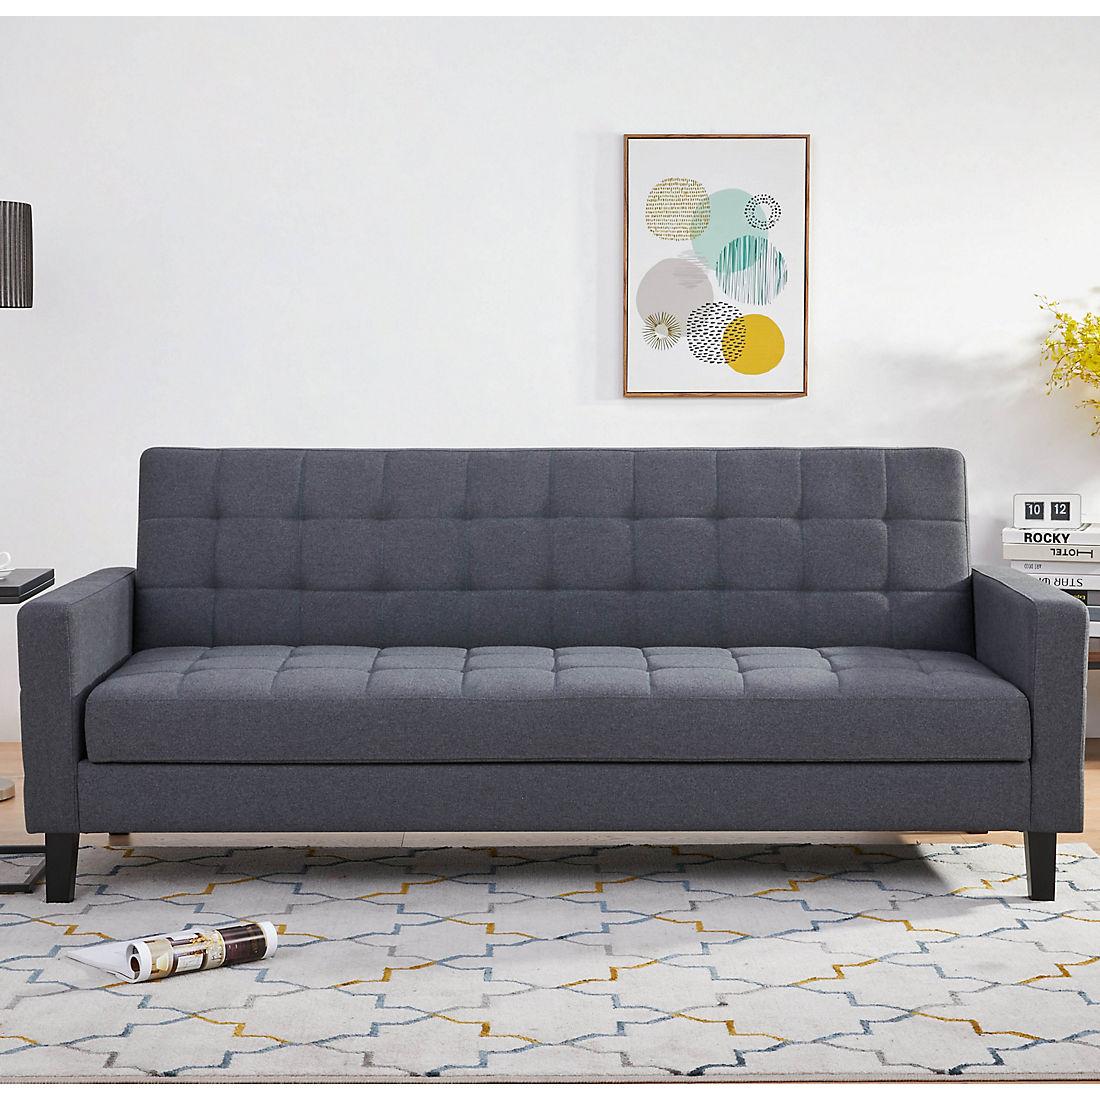 Enjoyable Abbyson Living Jackson Click Clack Sofa Bed With Storage Gray Ibusinesslaw Wood Chair Design Ideas Ibusinesslaworg